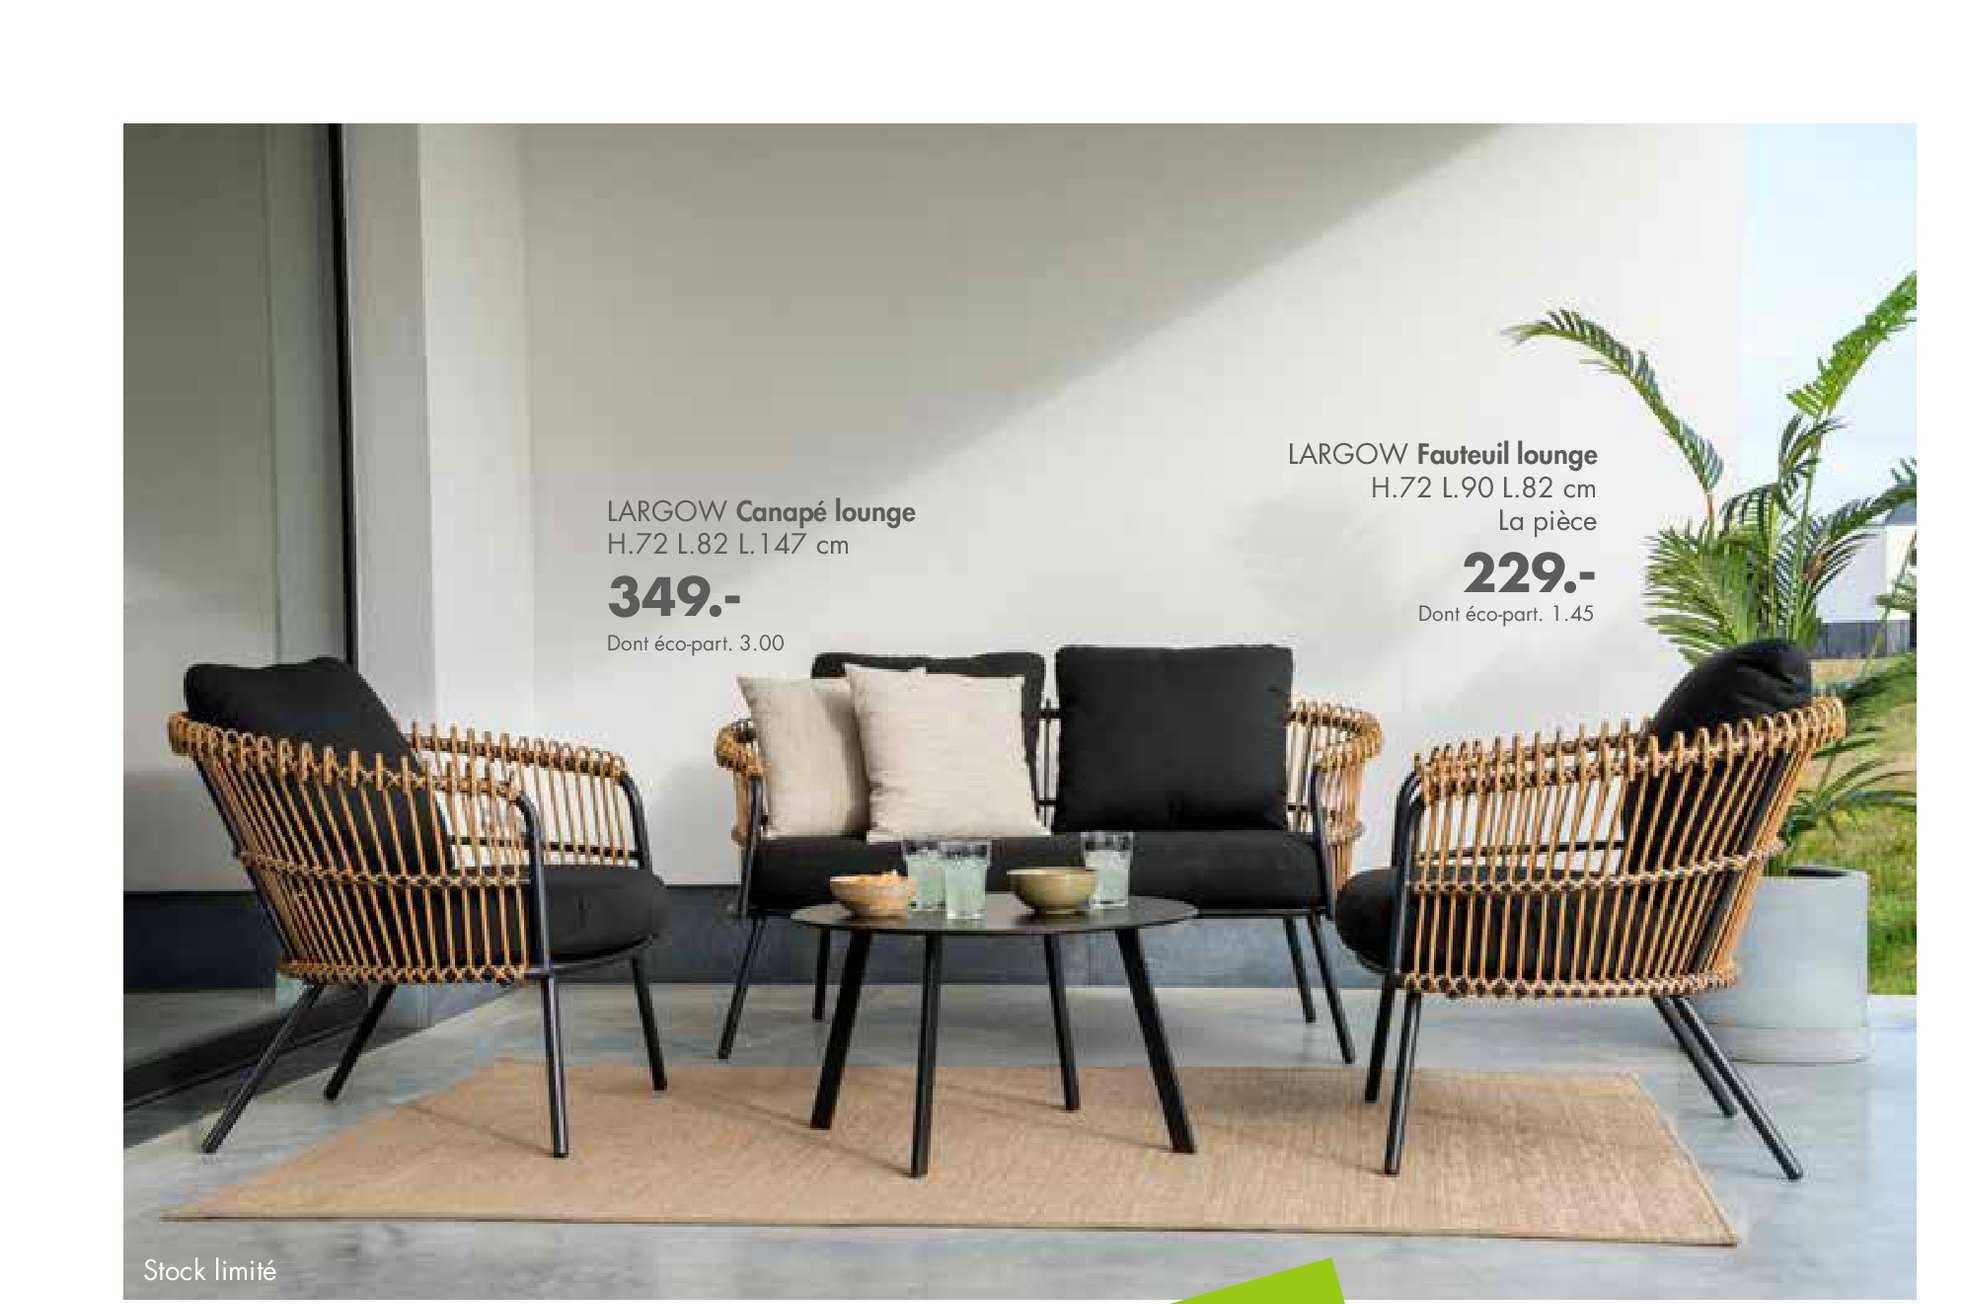 Casa Canapé Lounge Largow